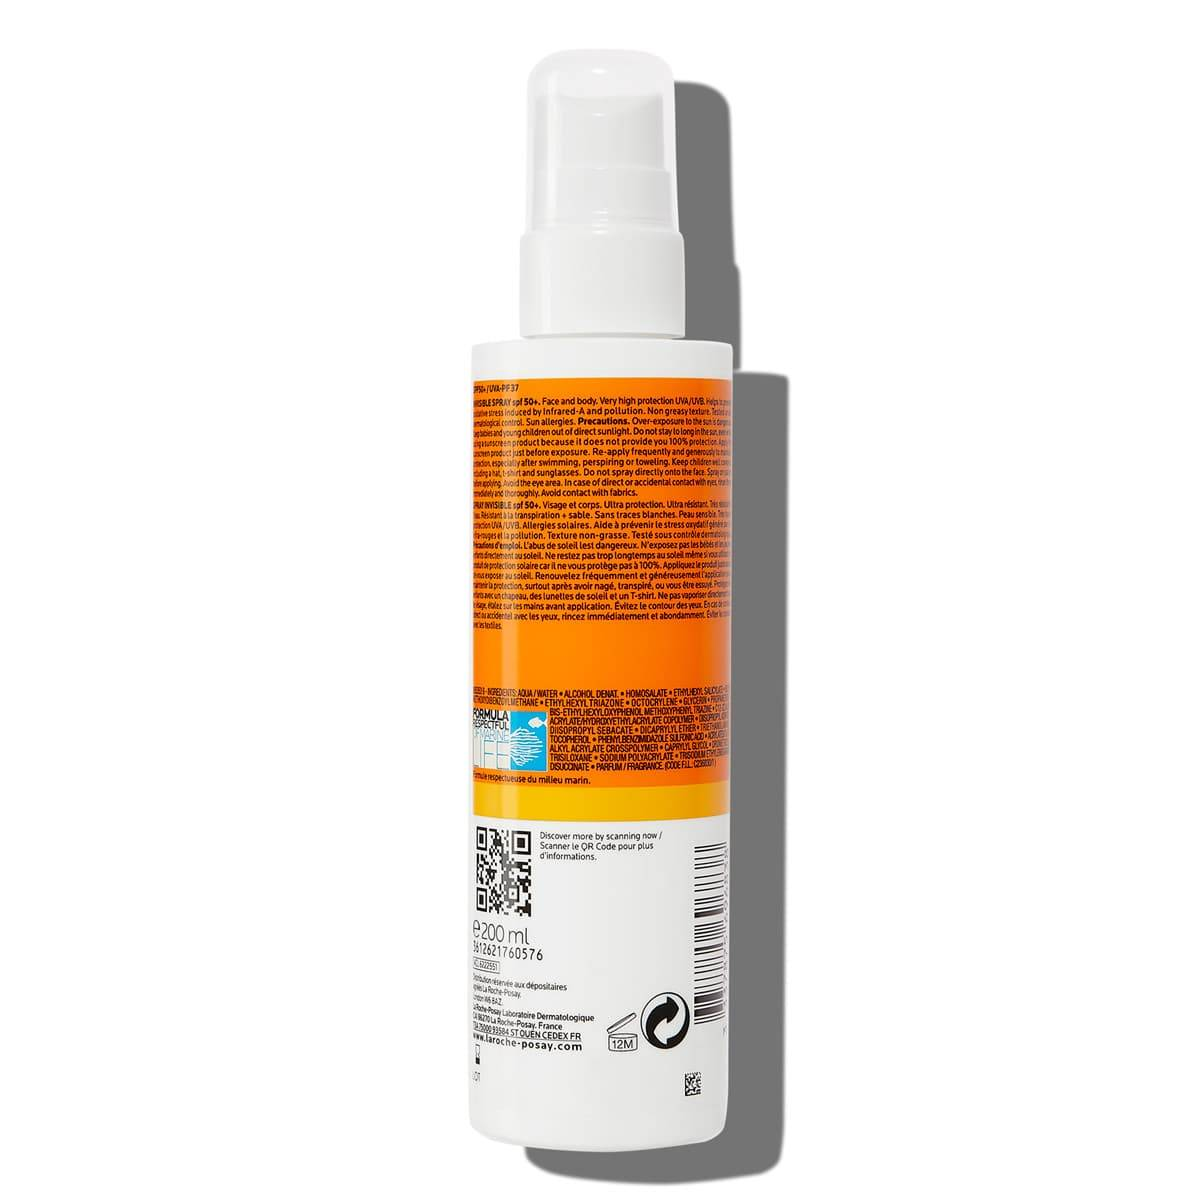 Ingredientes anthelios Spray invisible 50